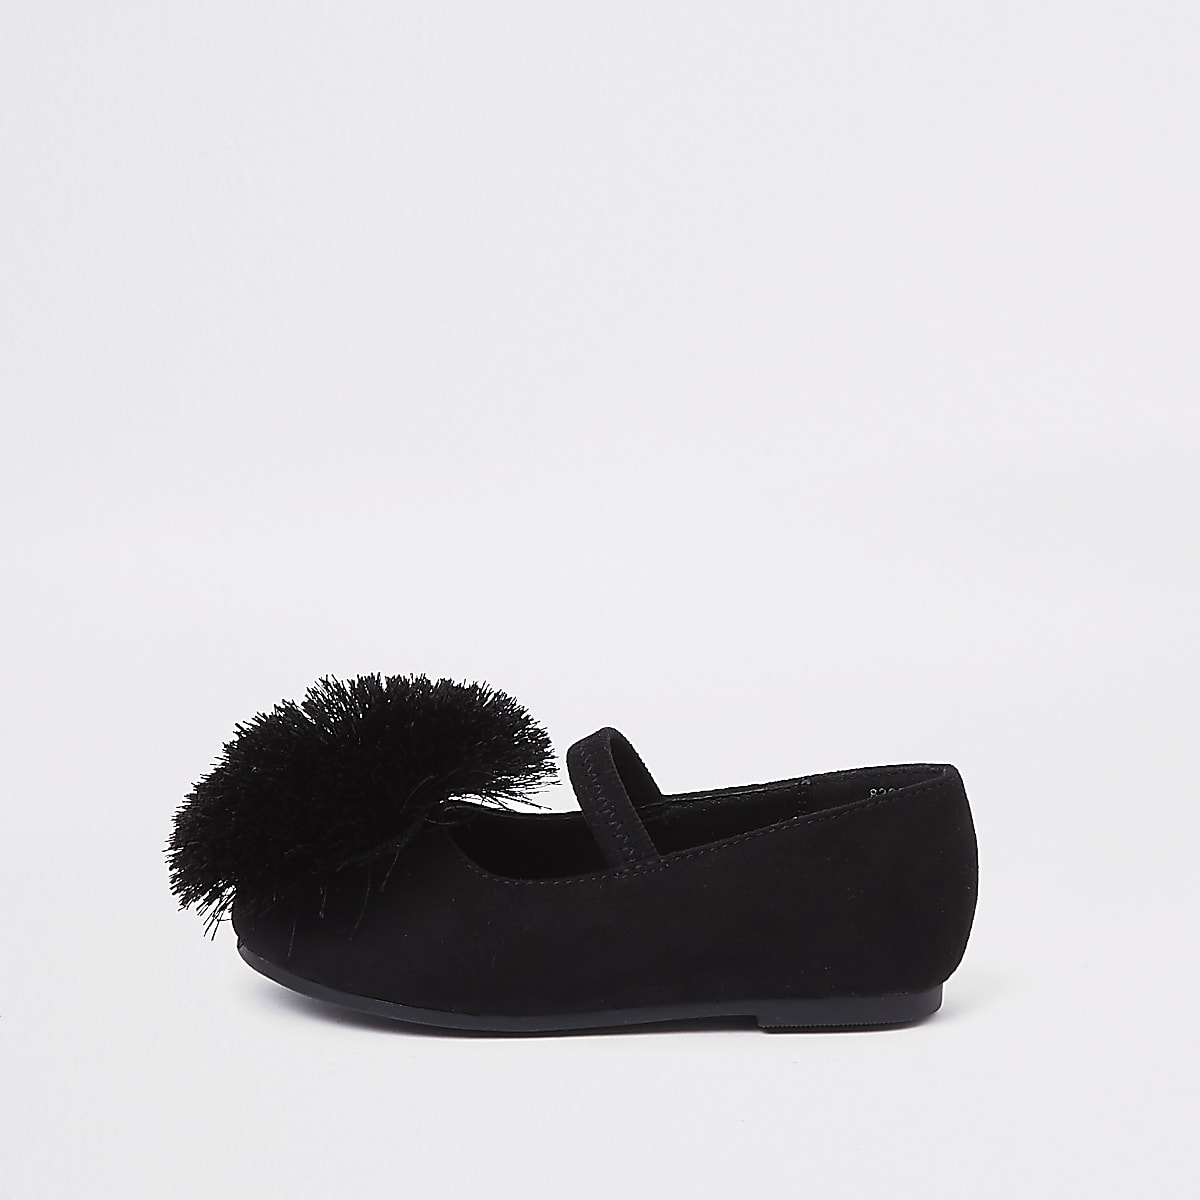 3a5661c14e2 Mini girls black pom pom ballerina pumps - Baby Girls Shoes - Baby Girls  Shoes   Boots - Mini Girls - girls